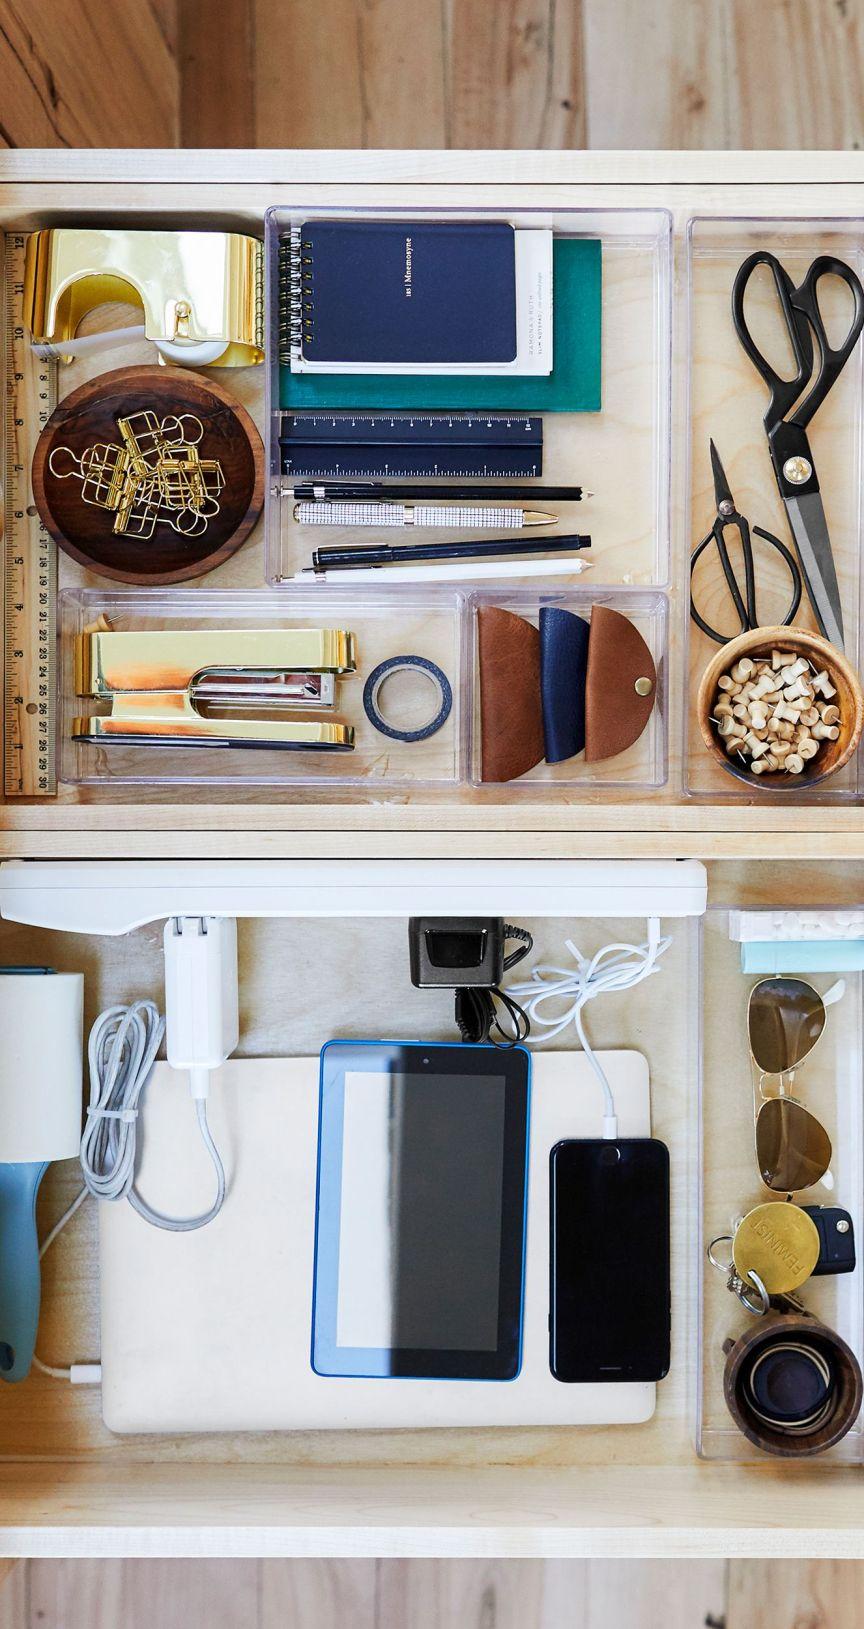 30 DIY Storage Ideas - Easy Home Storage Solutions